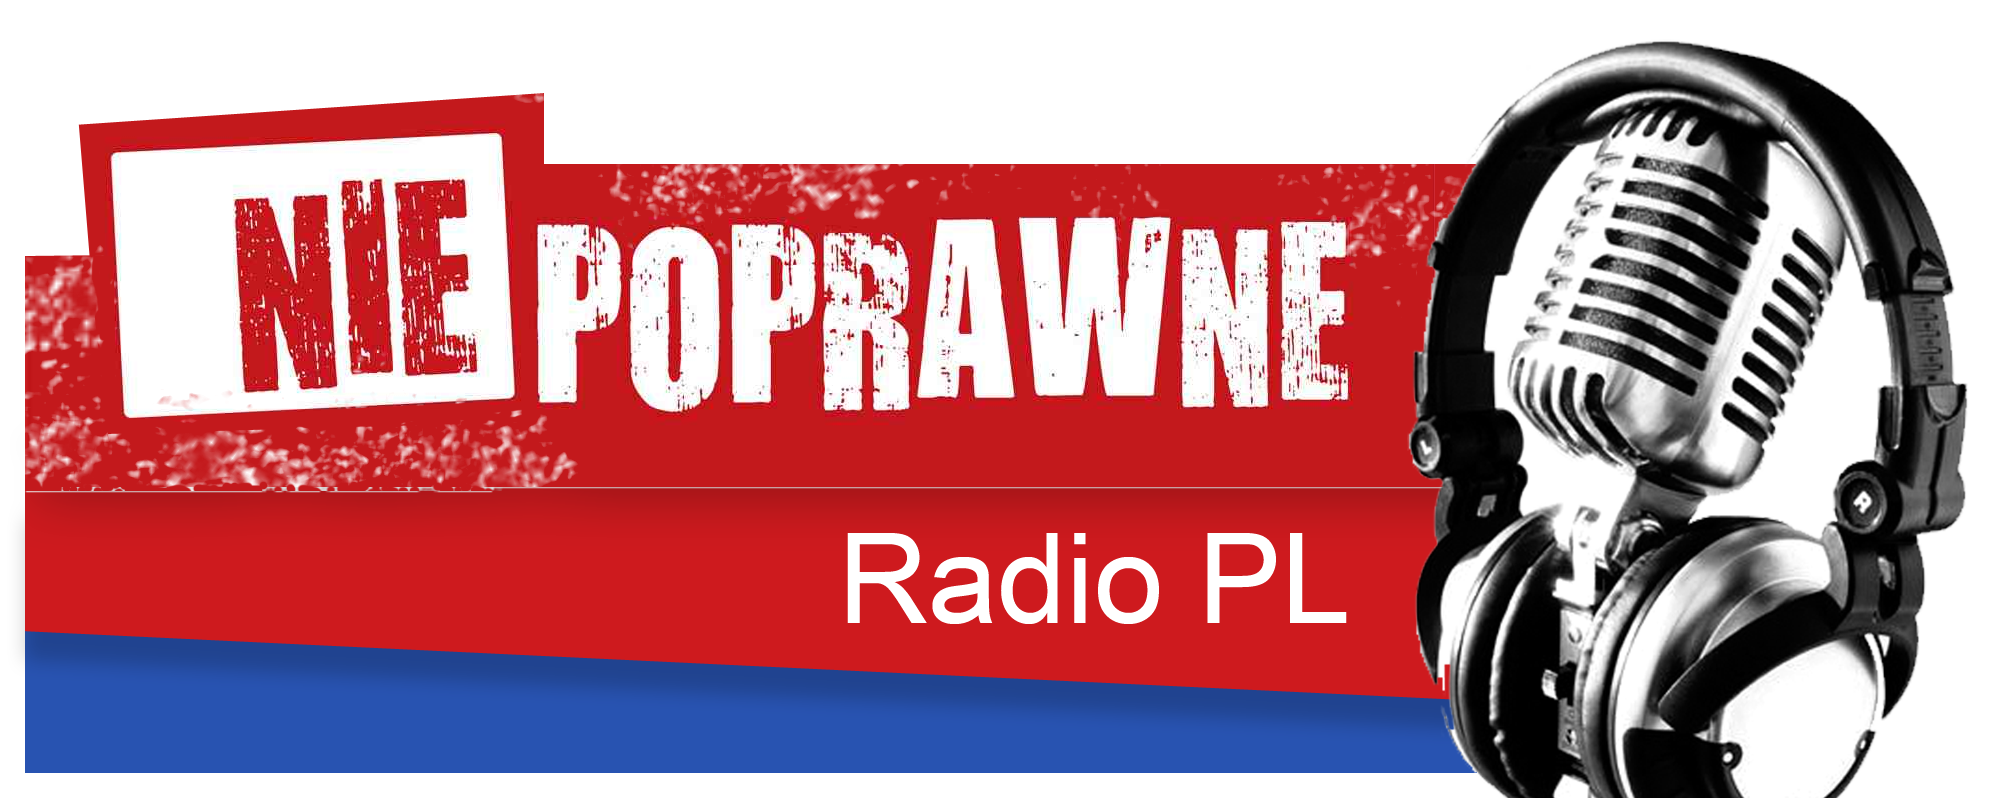 N.Radio.PL-Logotyp-08